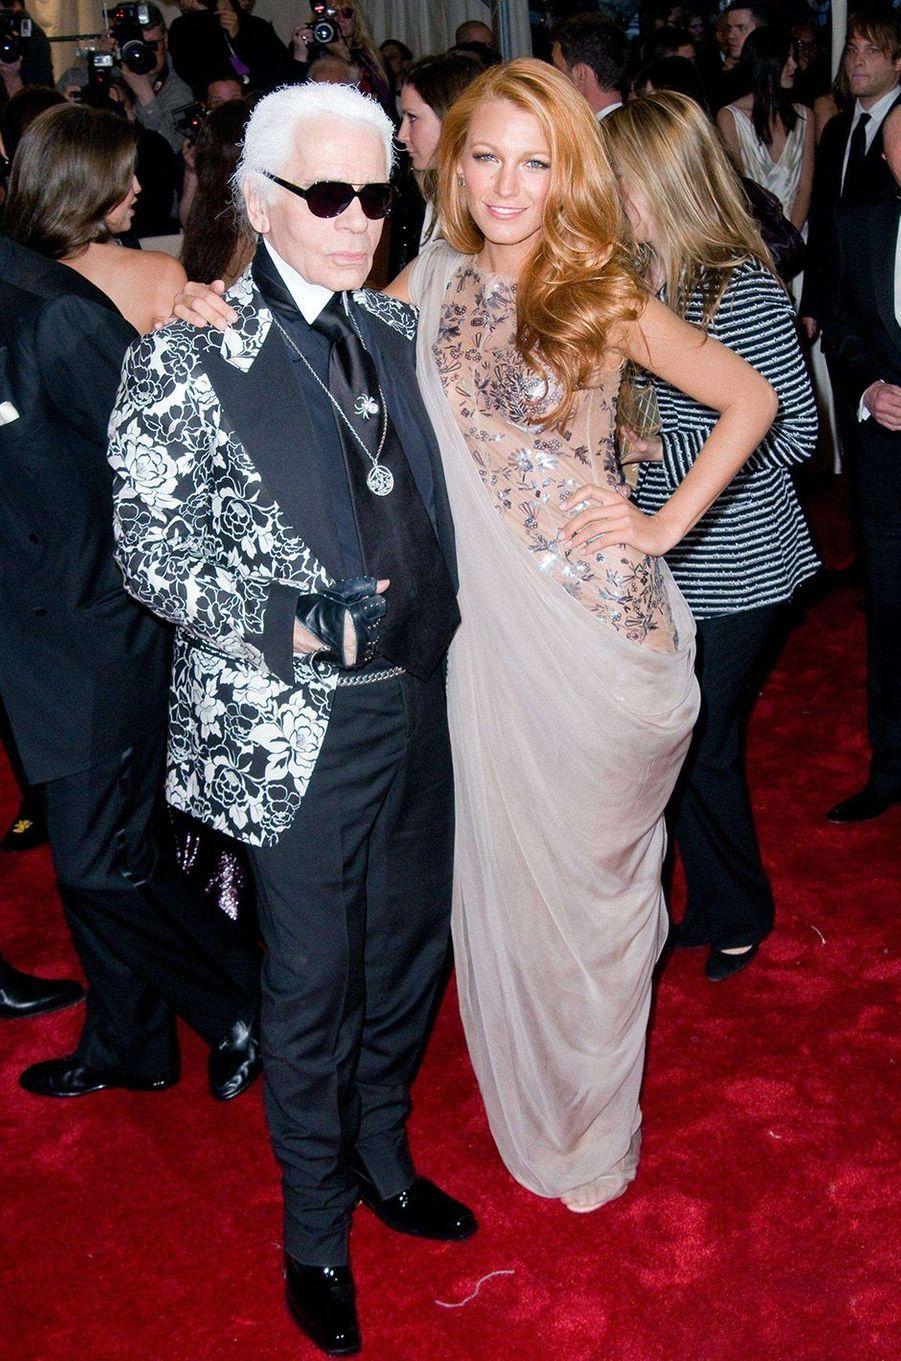 Karl Lagerfeld et Blake Lively au Met Gala 2011.